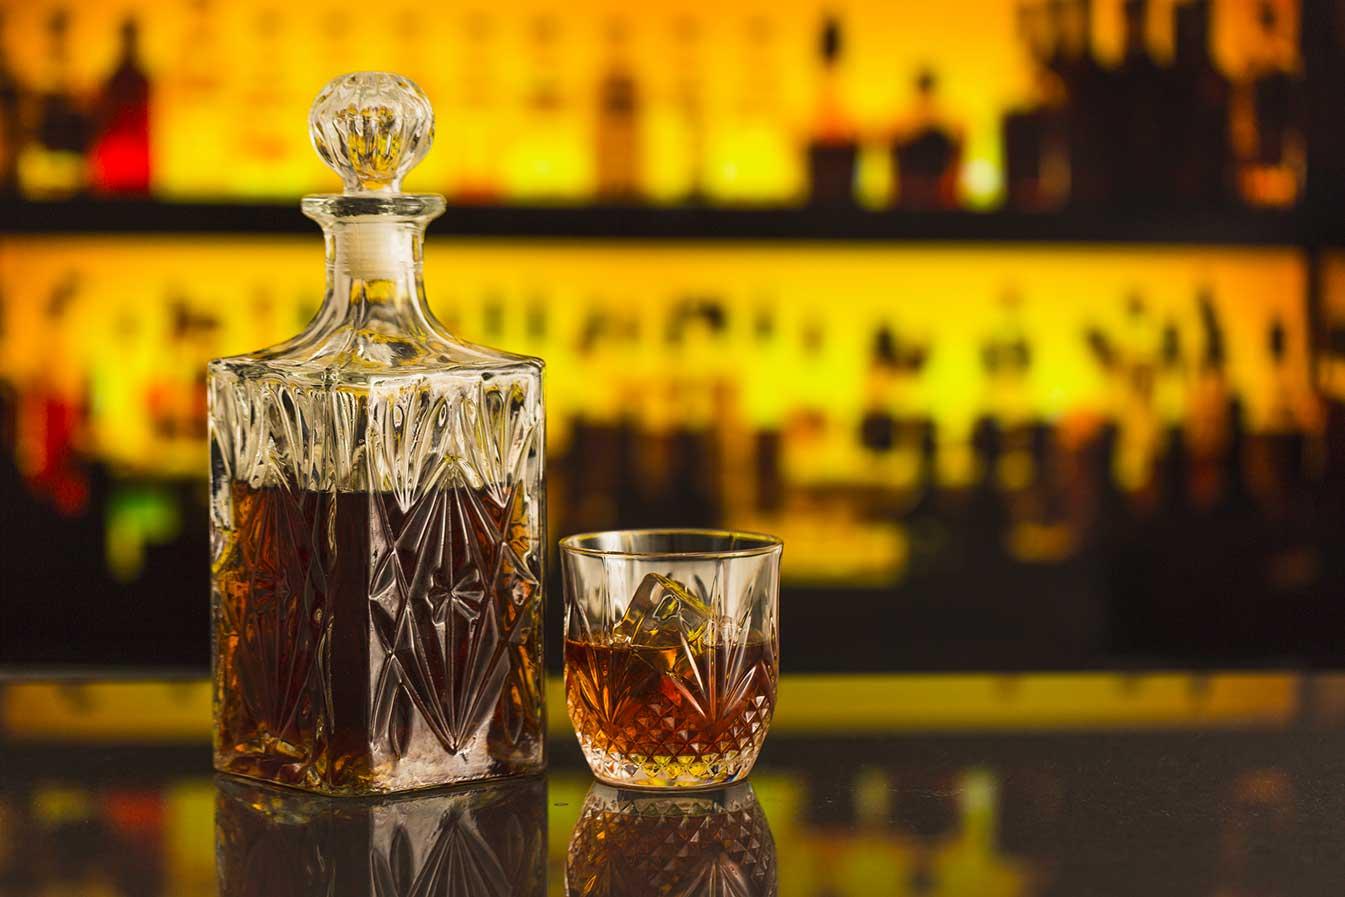 Bardazzilaw liquor license attorney New York